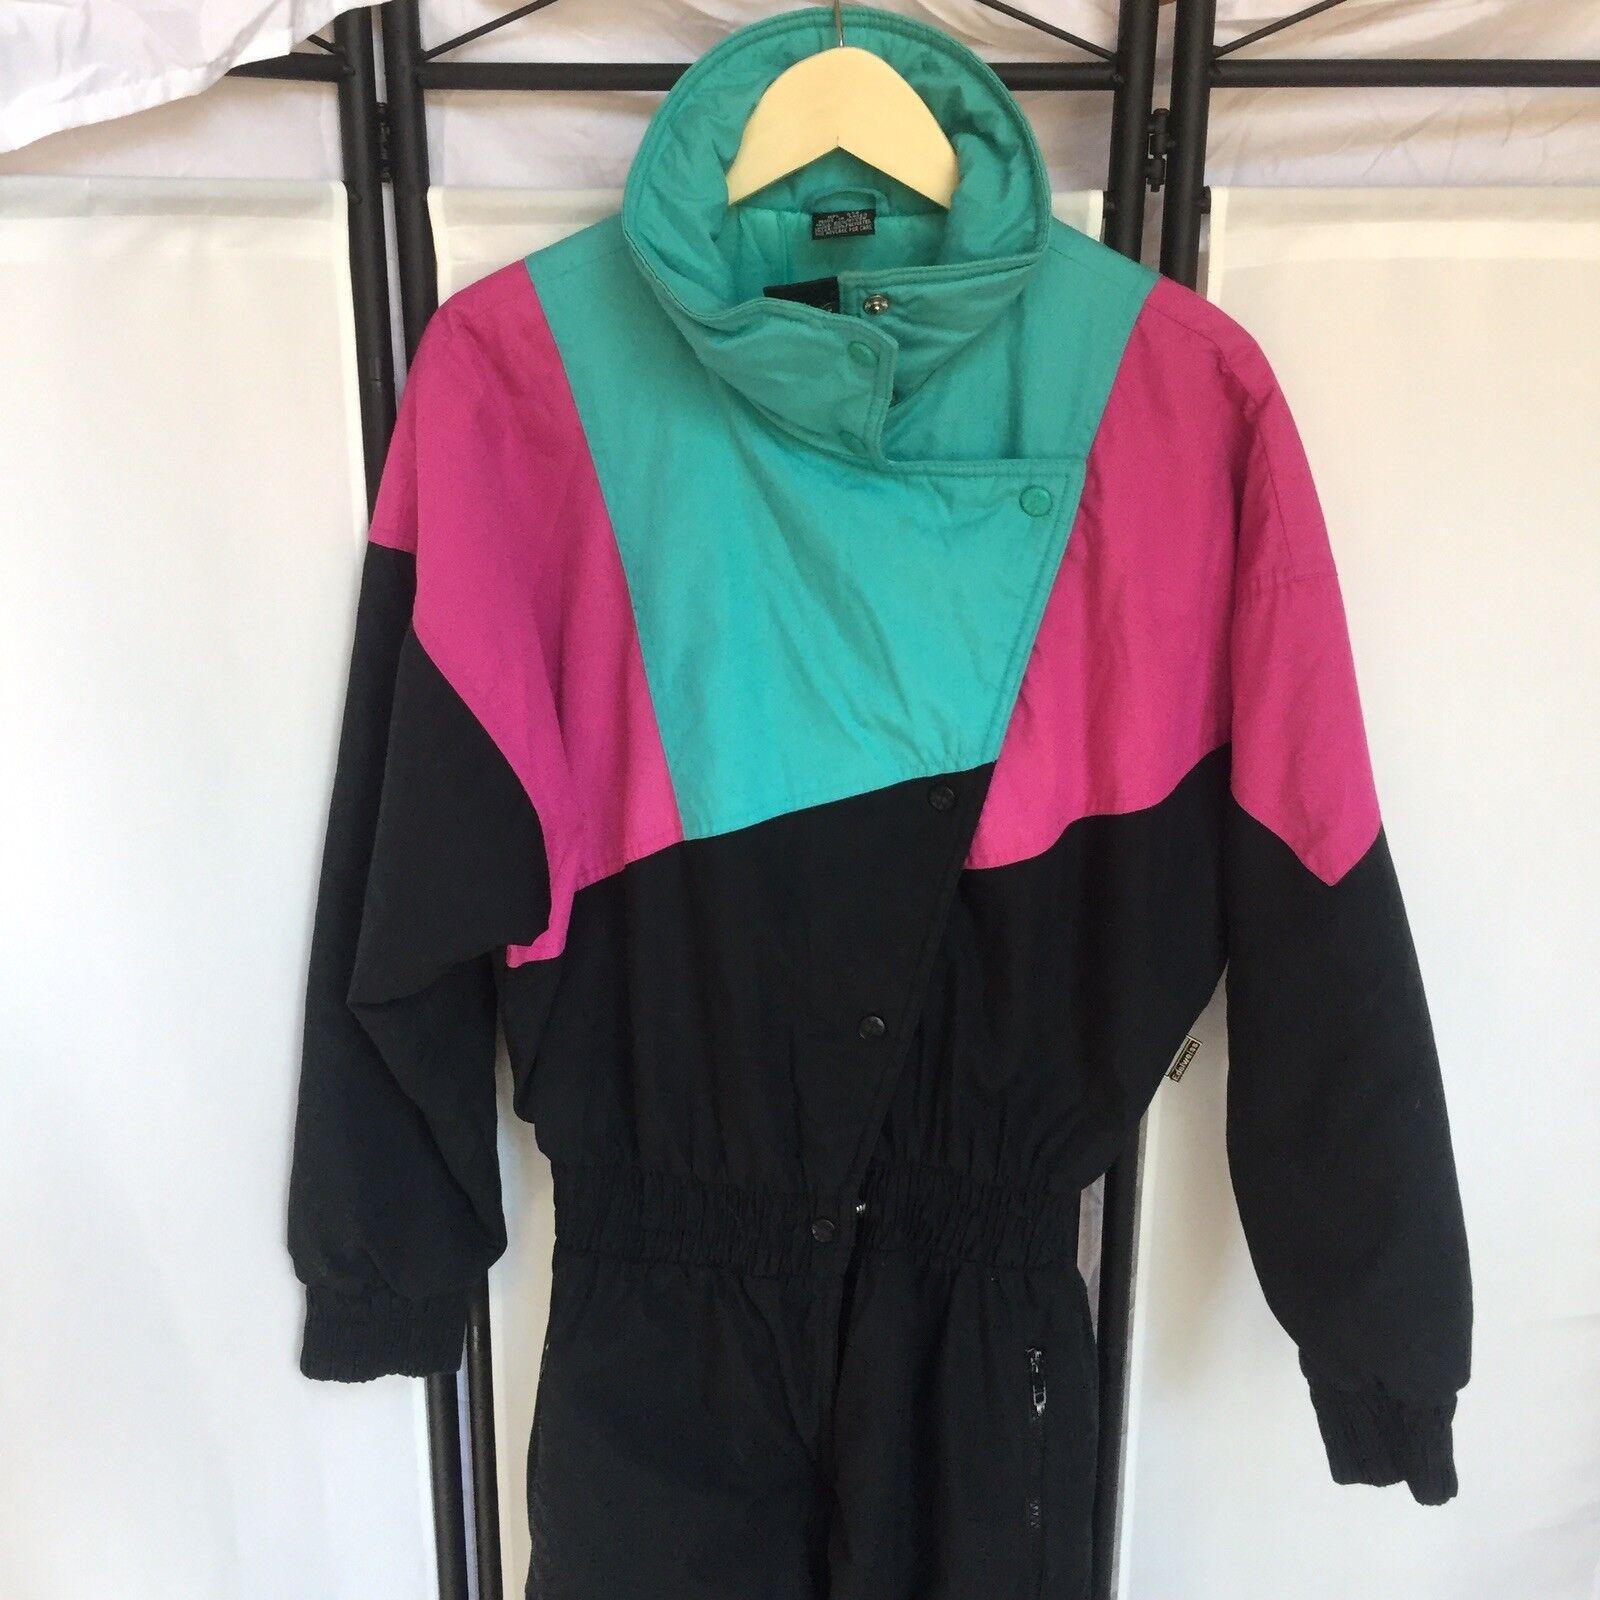 Edelweiss Vintage 80s 90s damen Größe 12 Snowsuit Ski Snowboard Super Cute